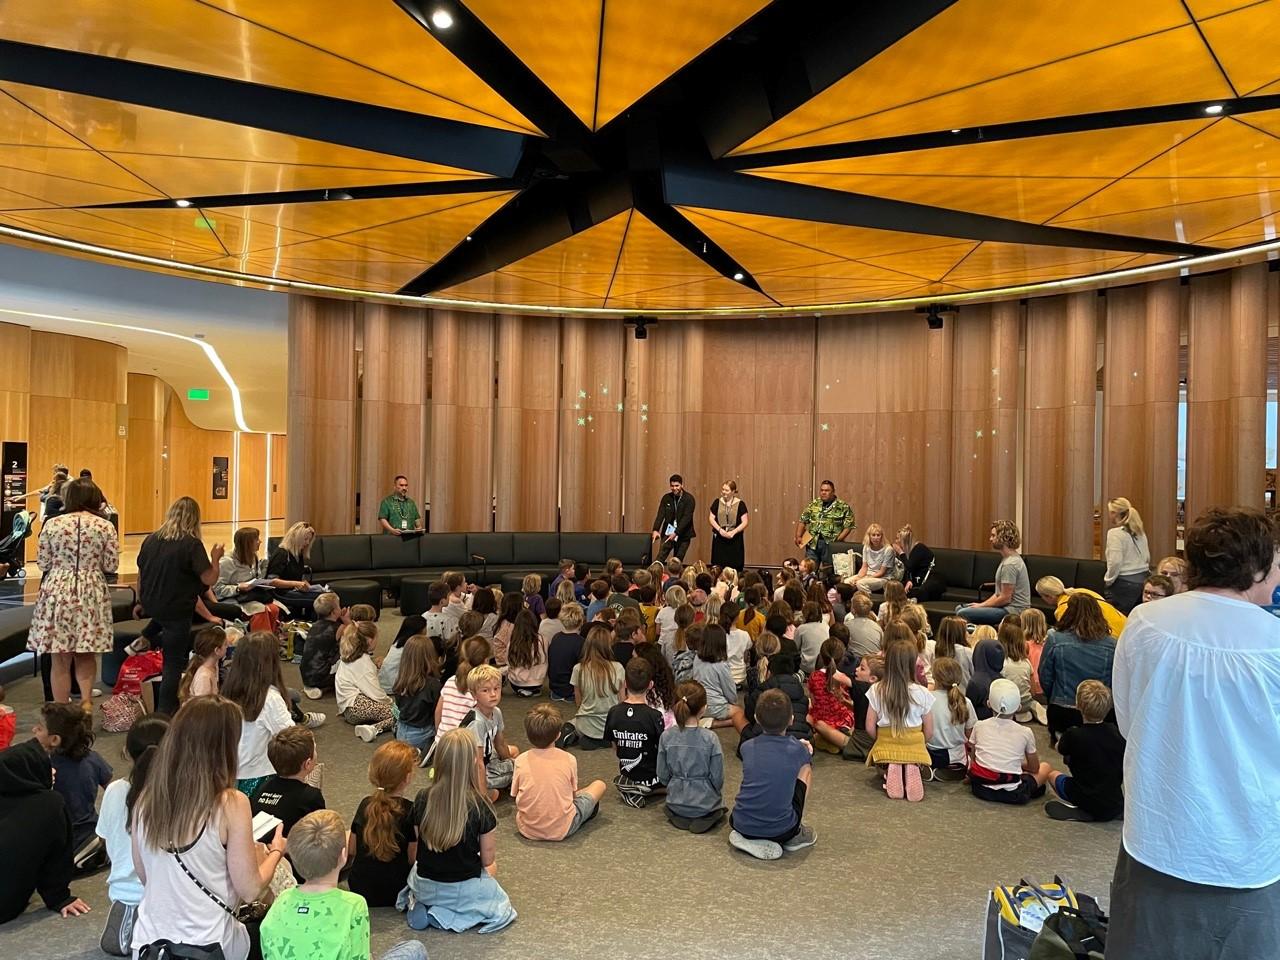 Welcoming learners to Te Ao Mārama South Atrium.